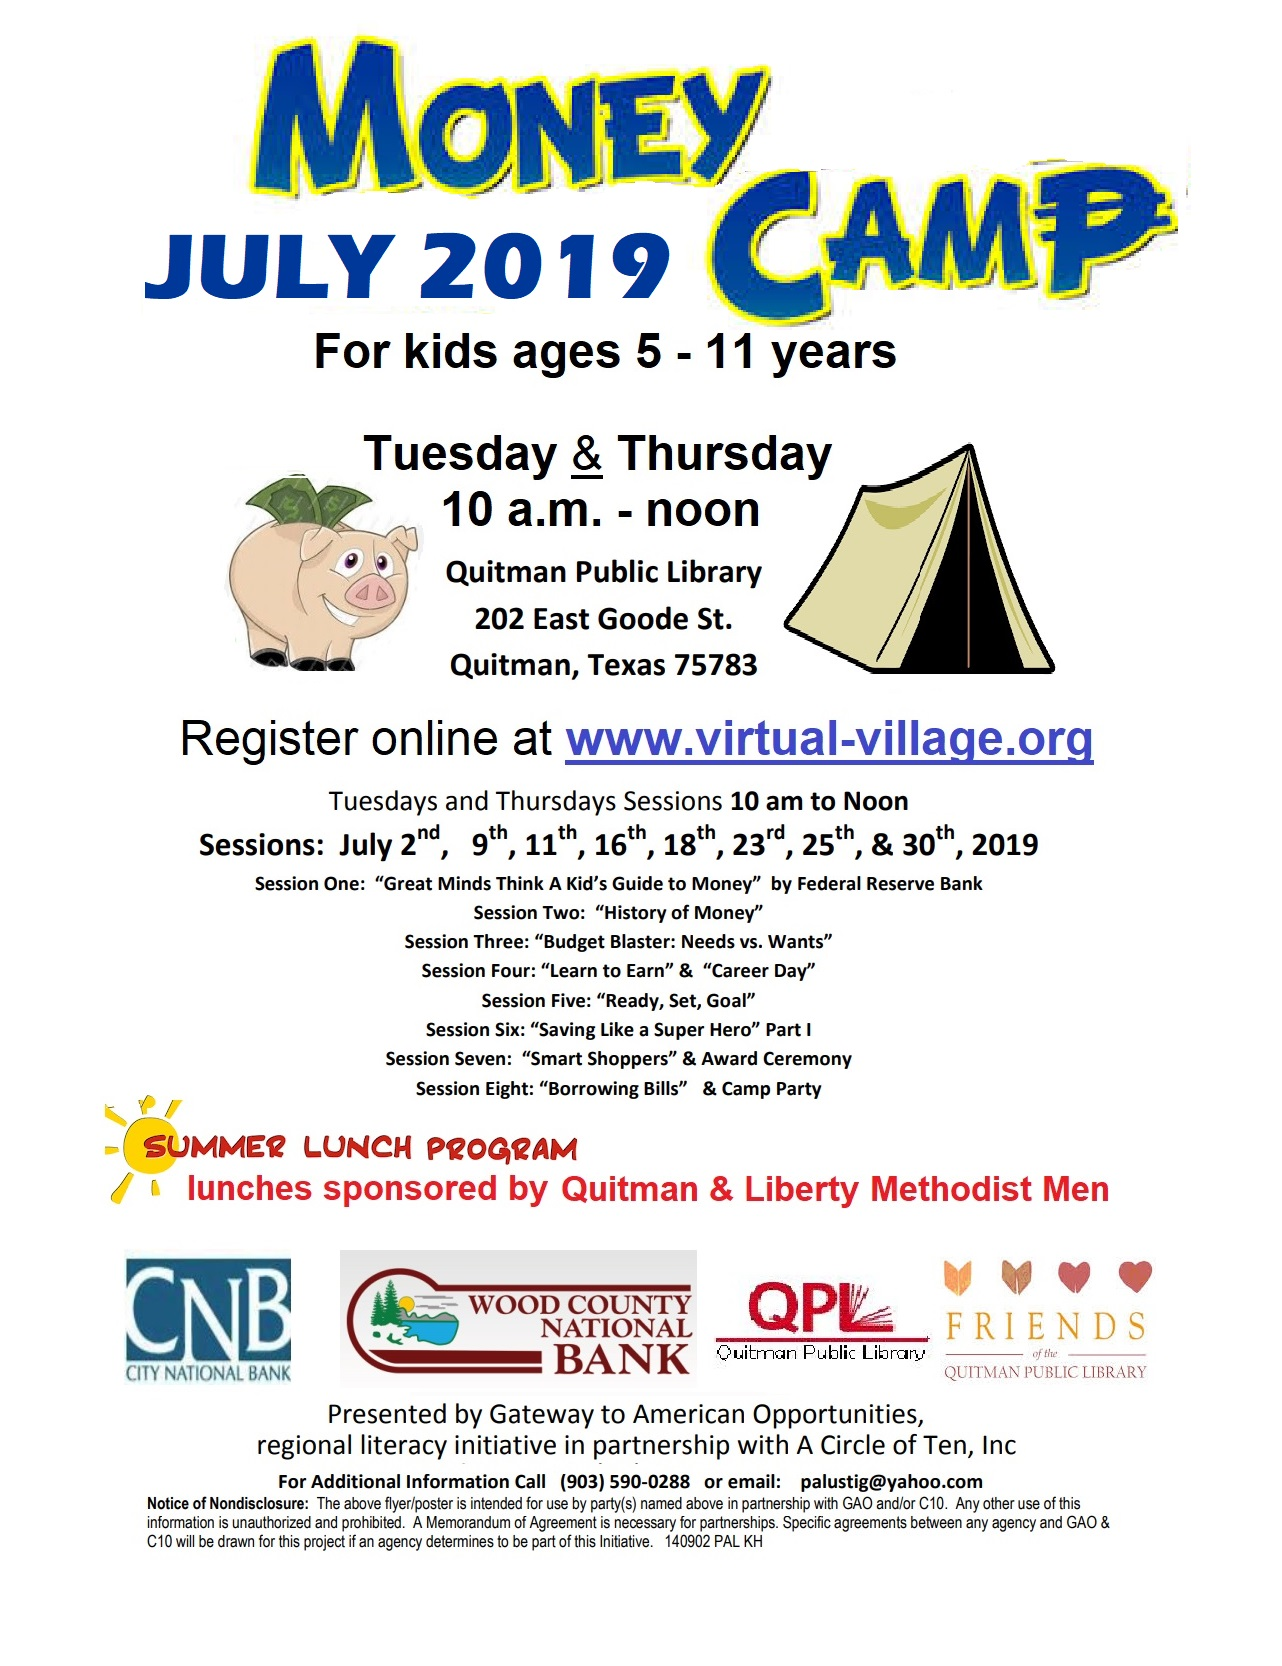 Money Camp July 2019 flier revised.jpg